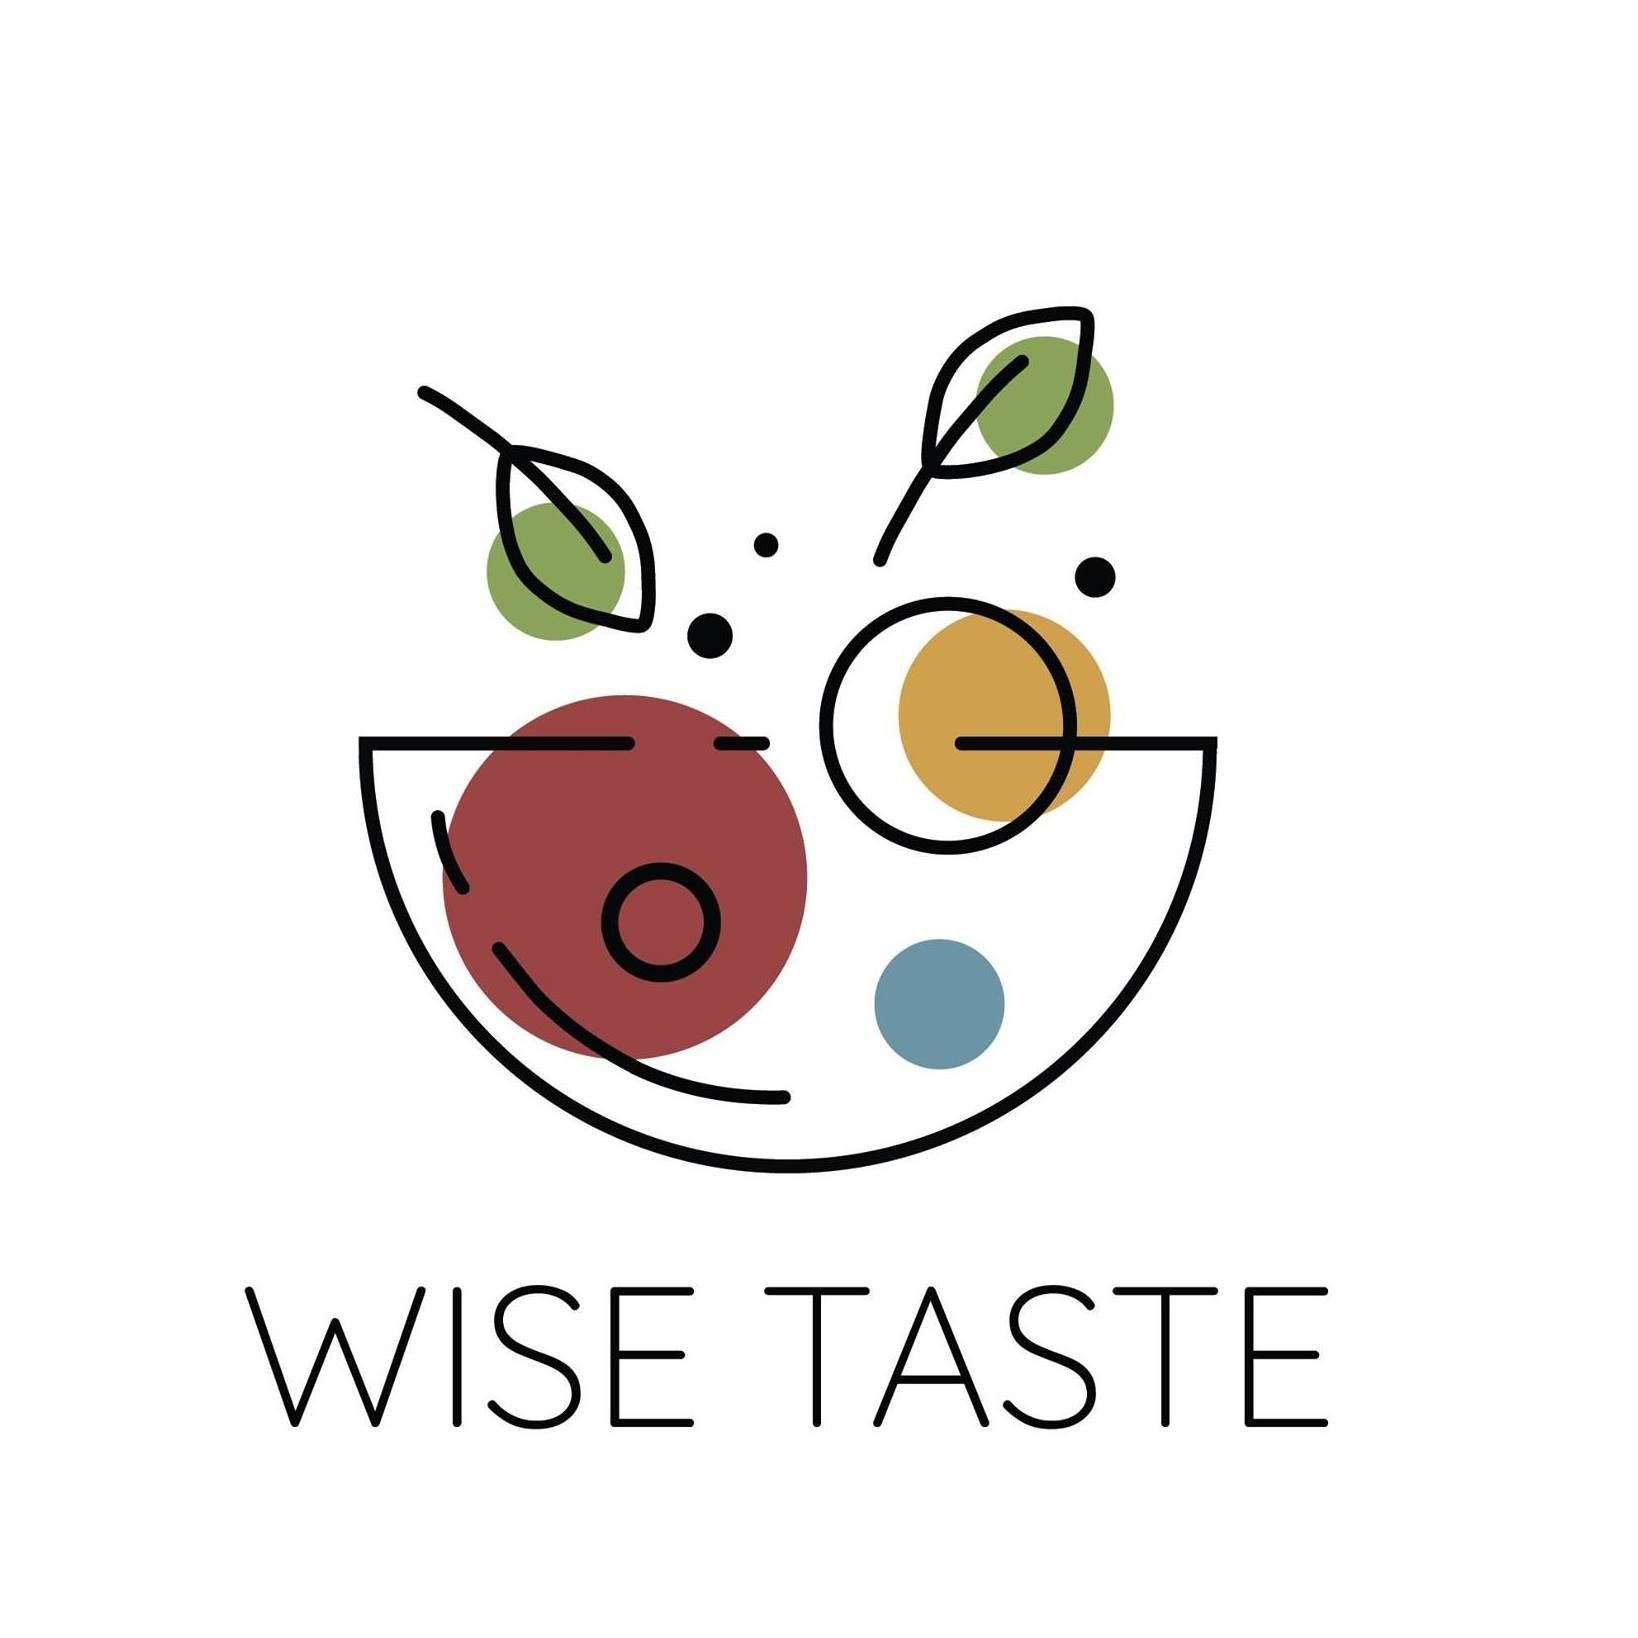 wise taste